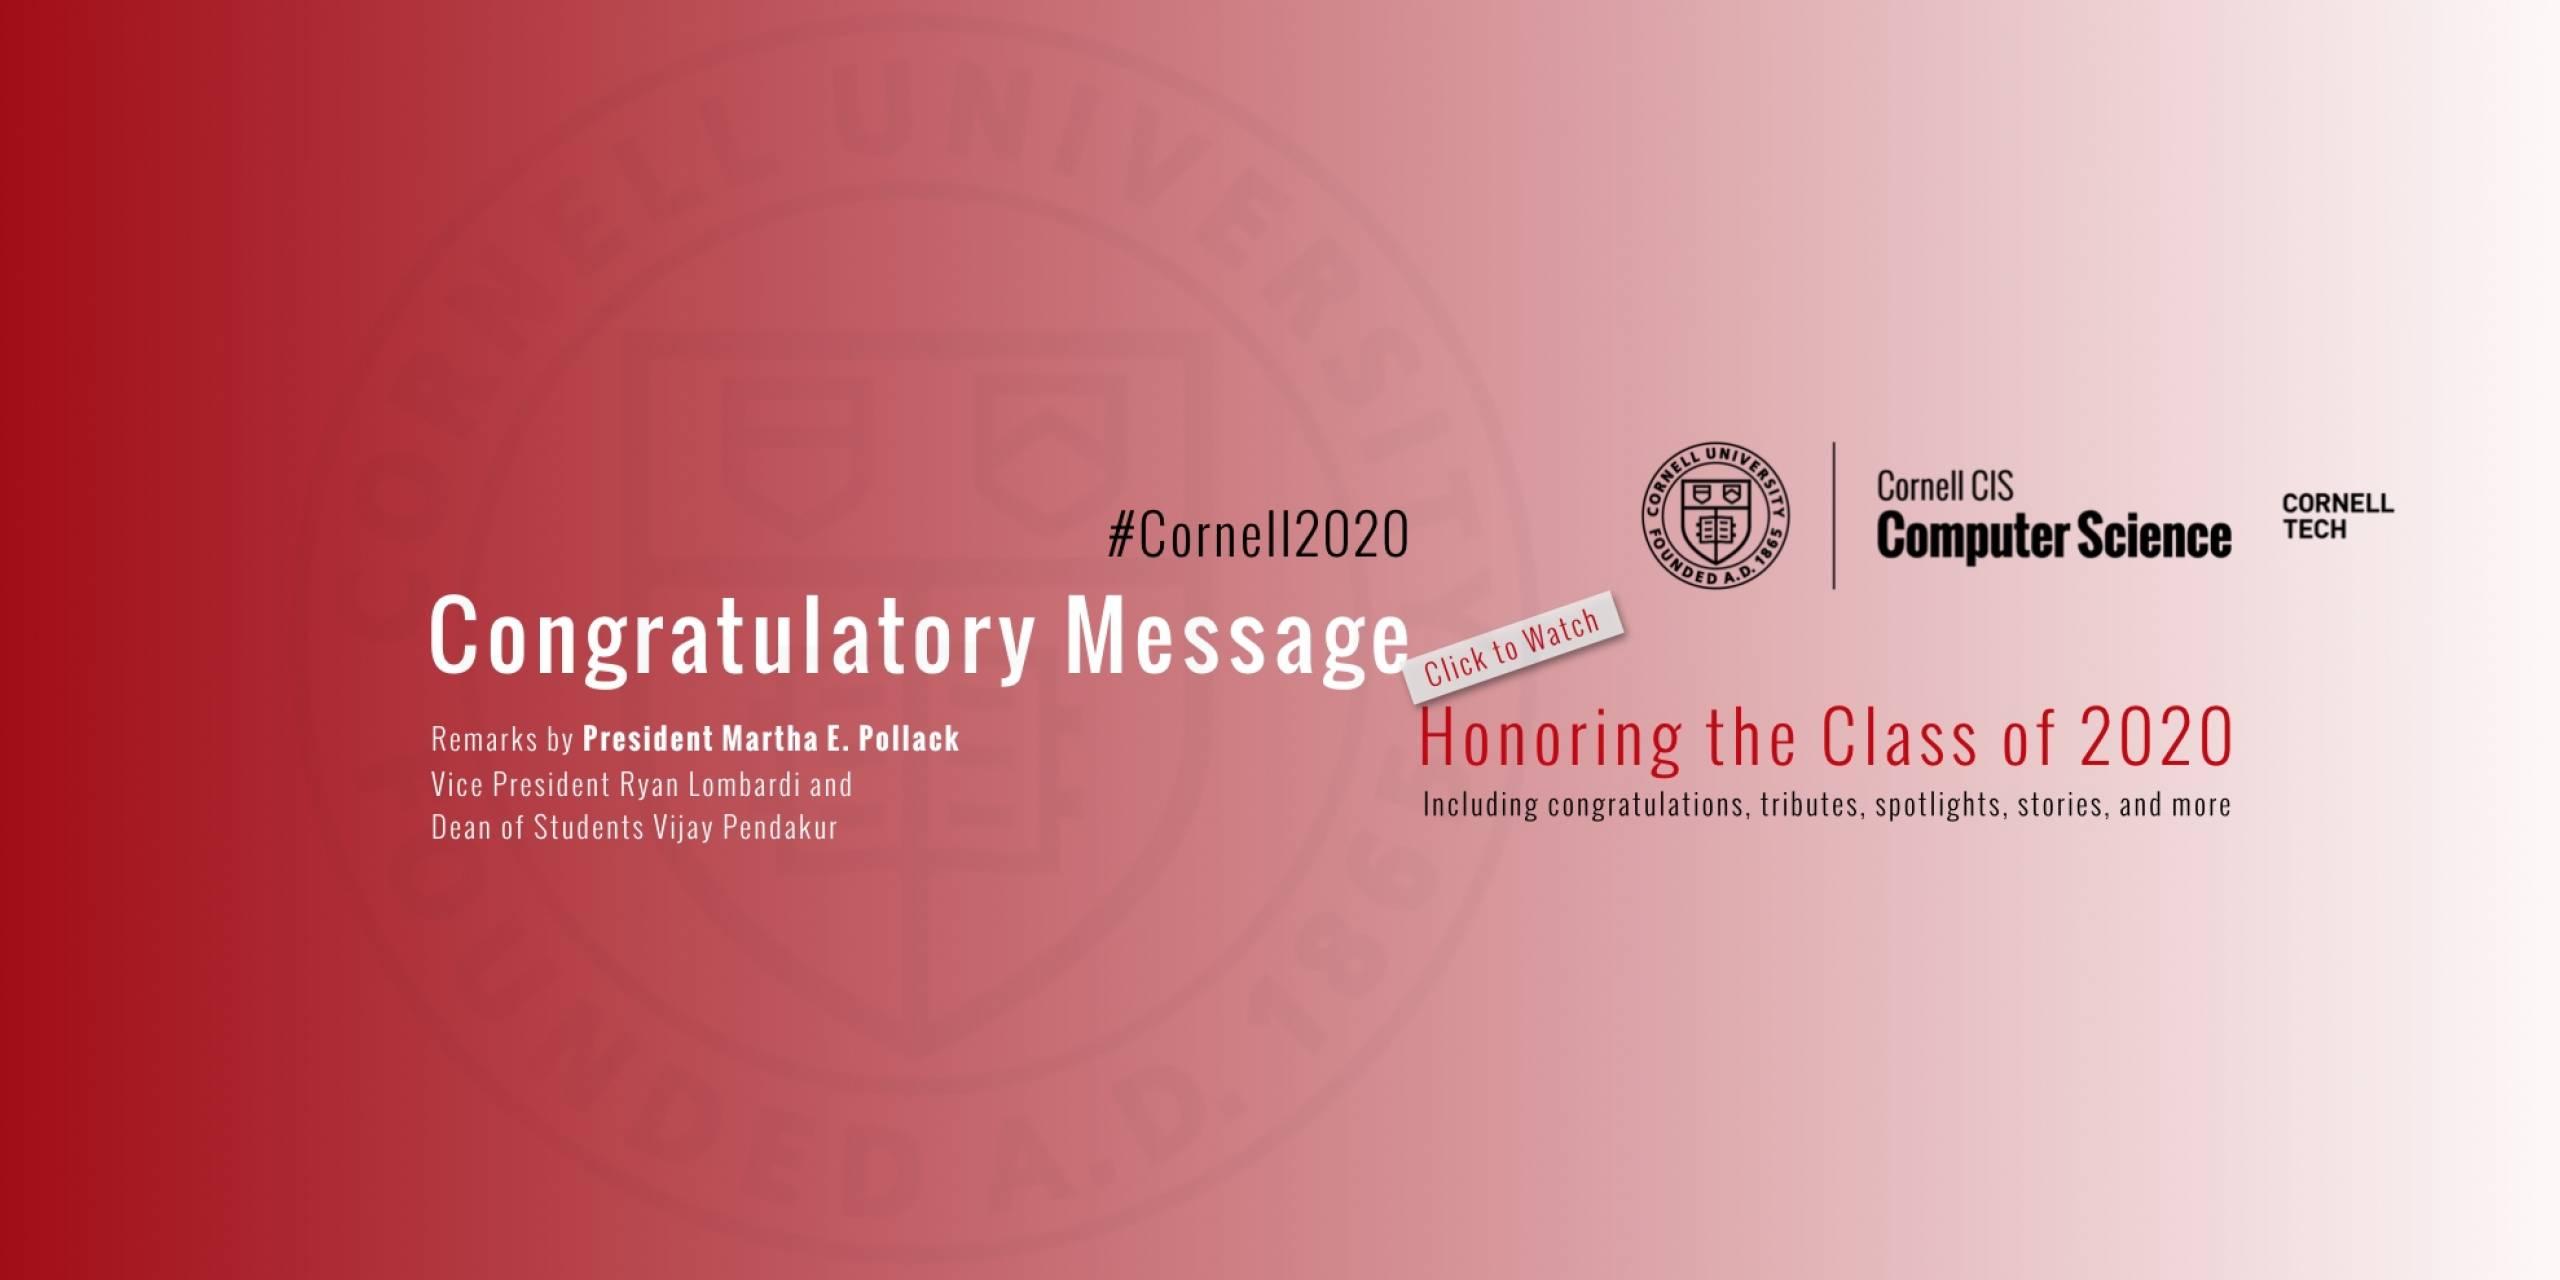 Congratulatory Message, Honoring the Class of 2020